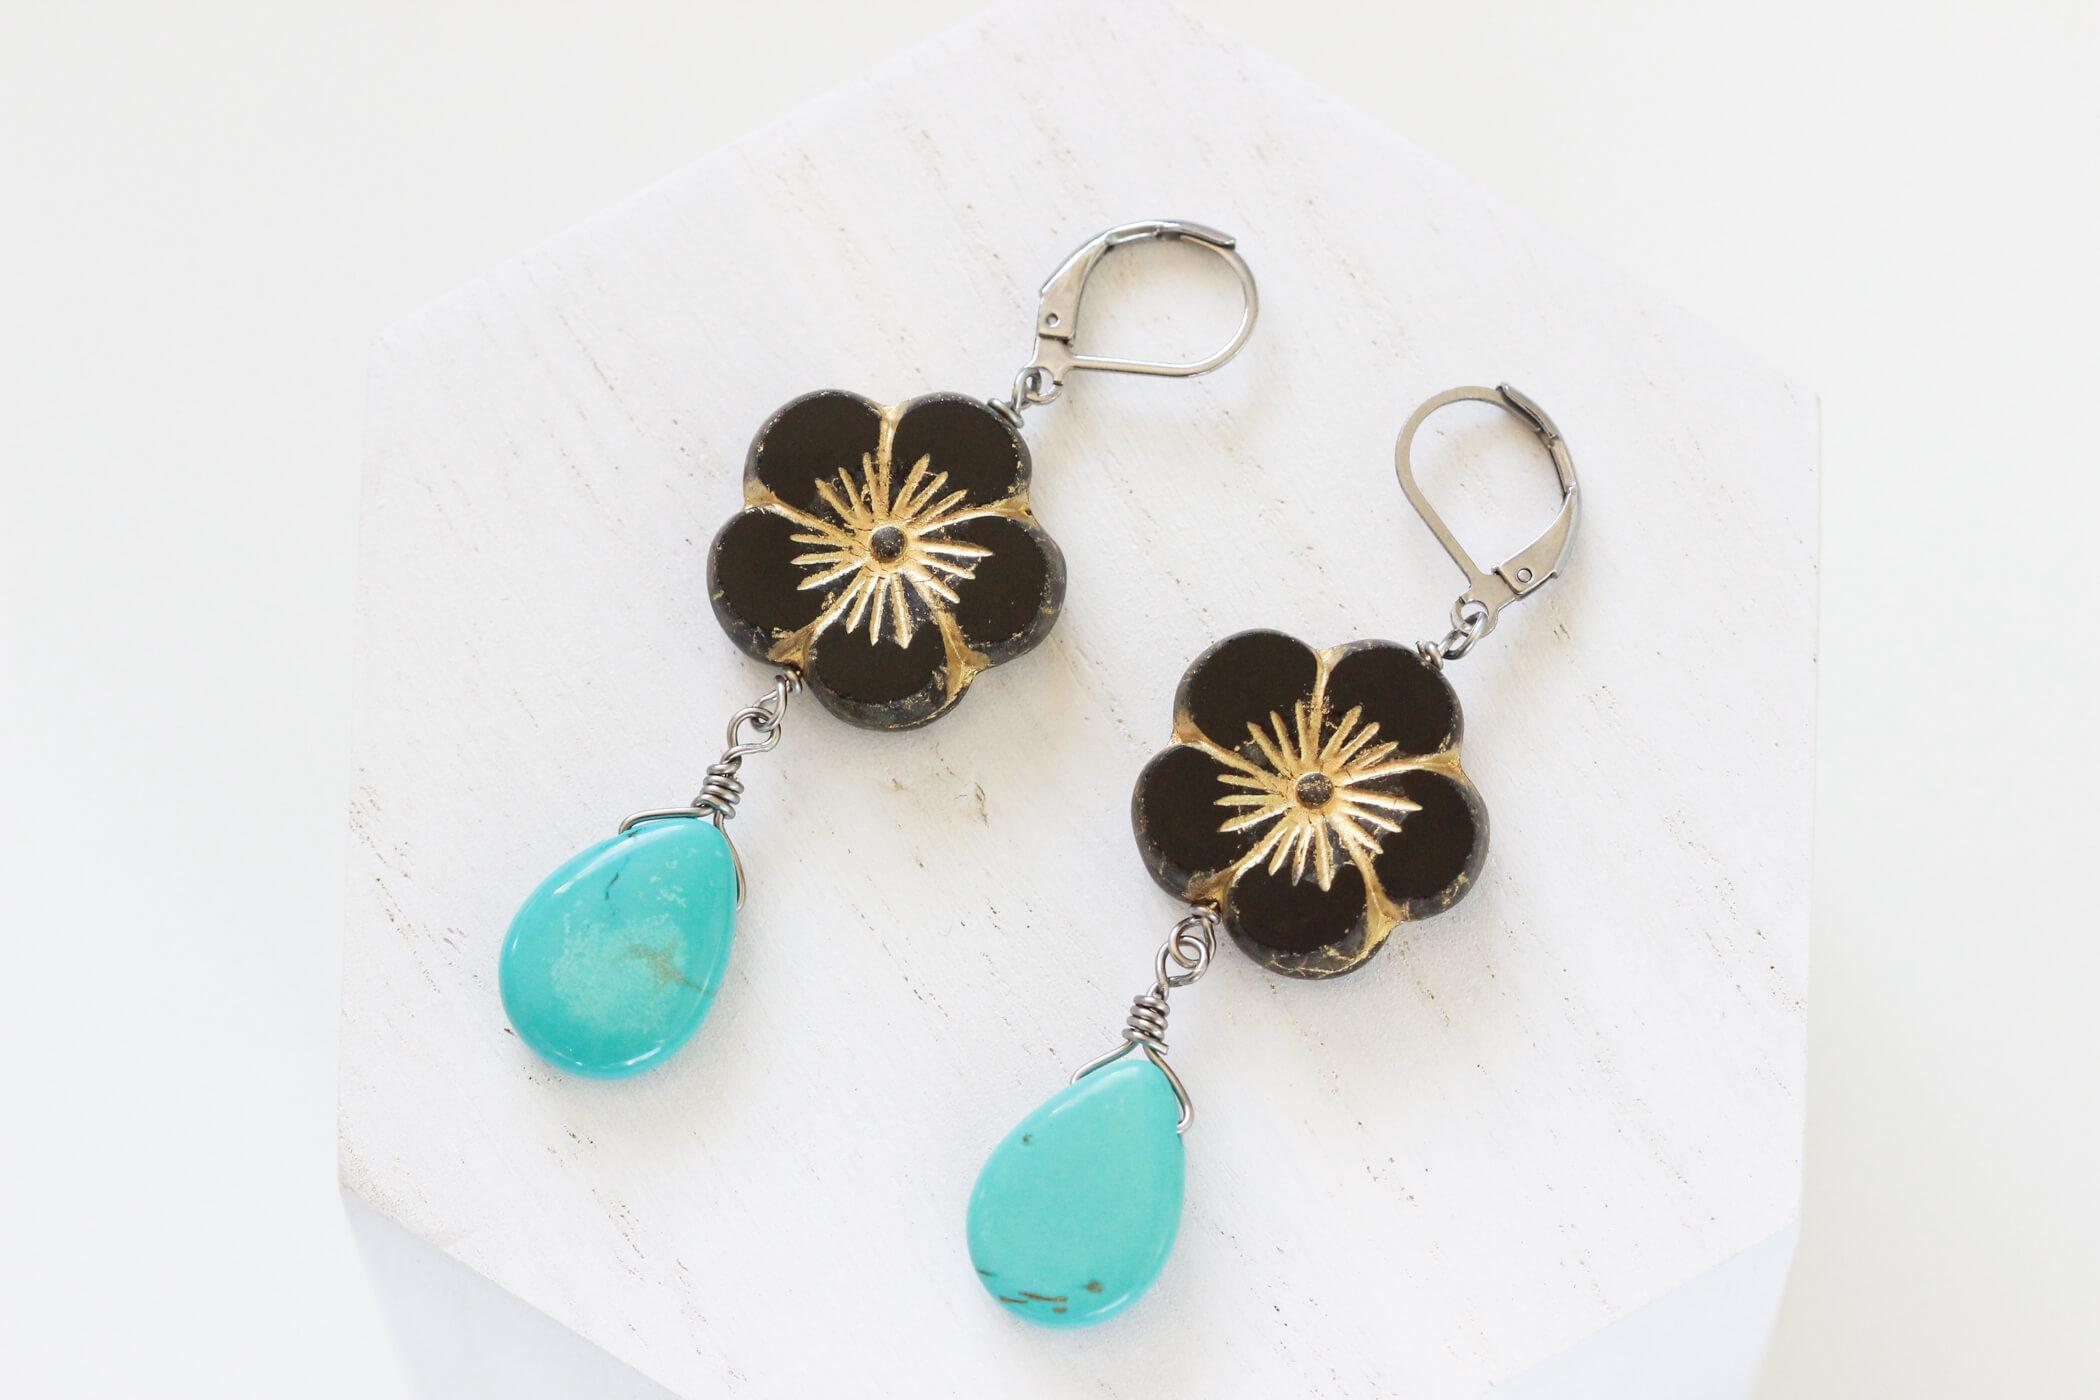 Handmade Designer Jewelry by Kaleidoscopes And Polka Dots